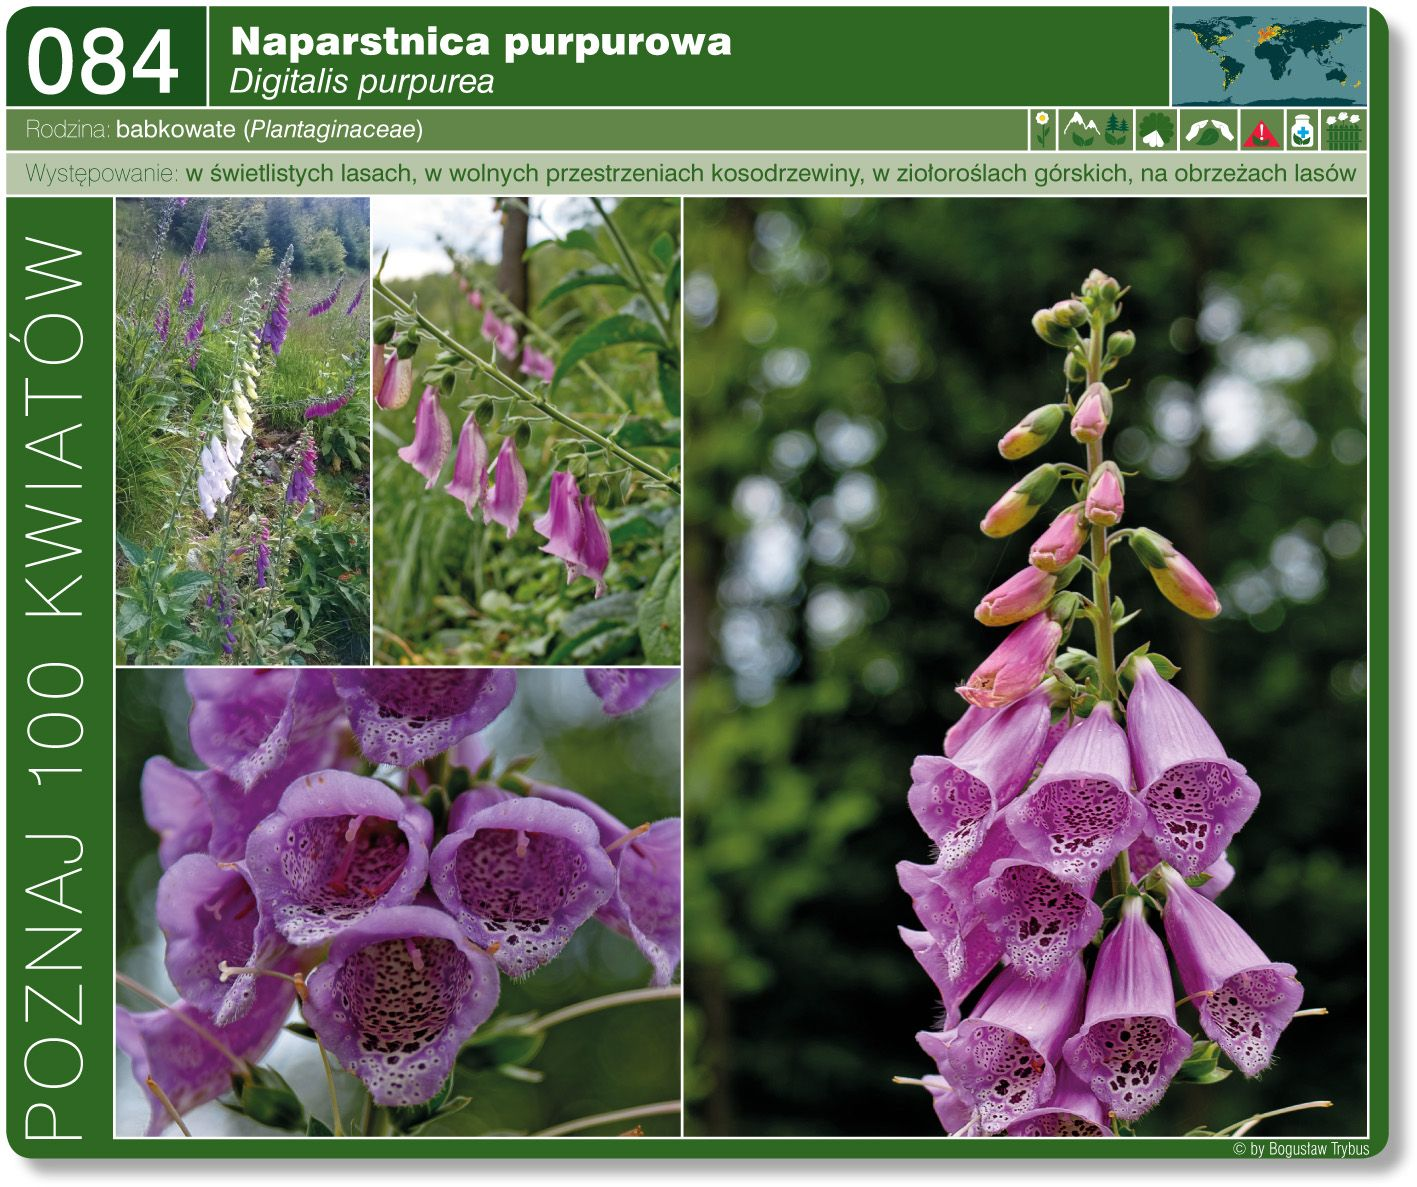 Naparstnica Purpurowa Plants